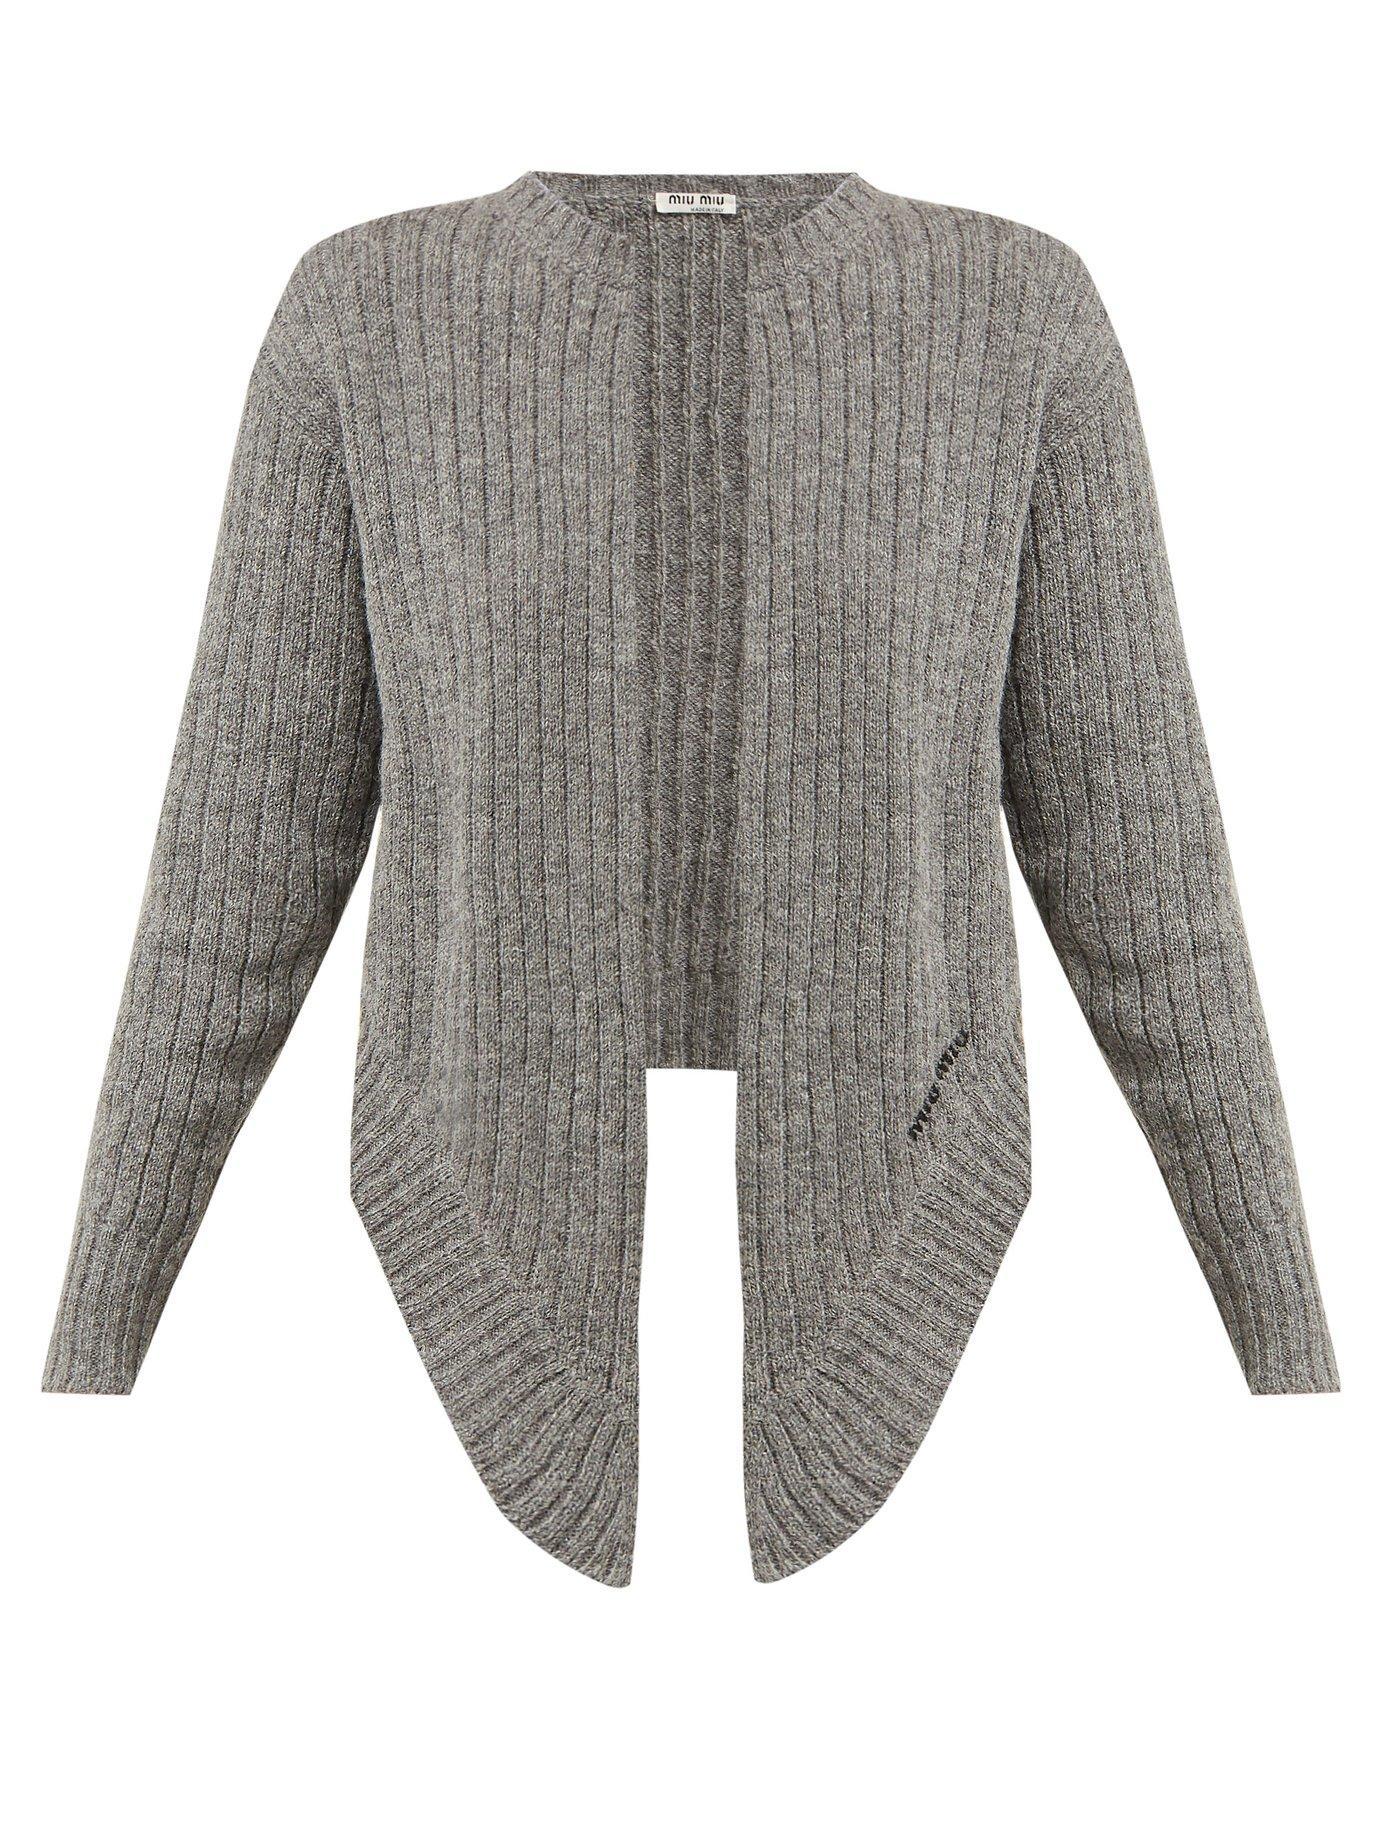 77c484c26d47 Lyst - Miu Miu Tie Front Wool Cardigan in Gray